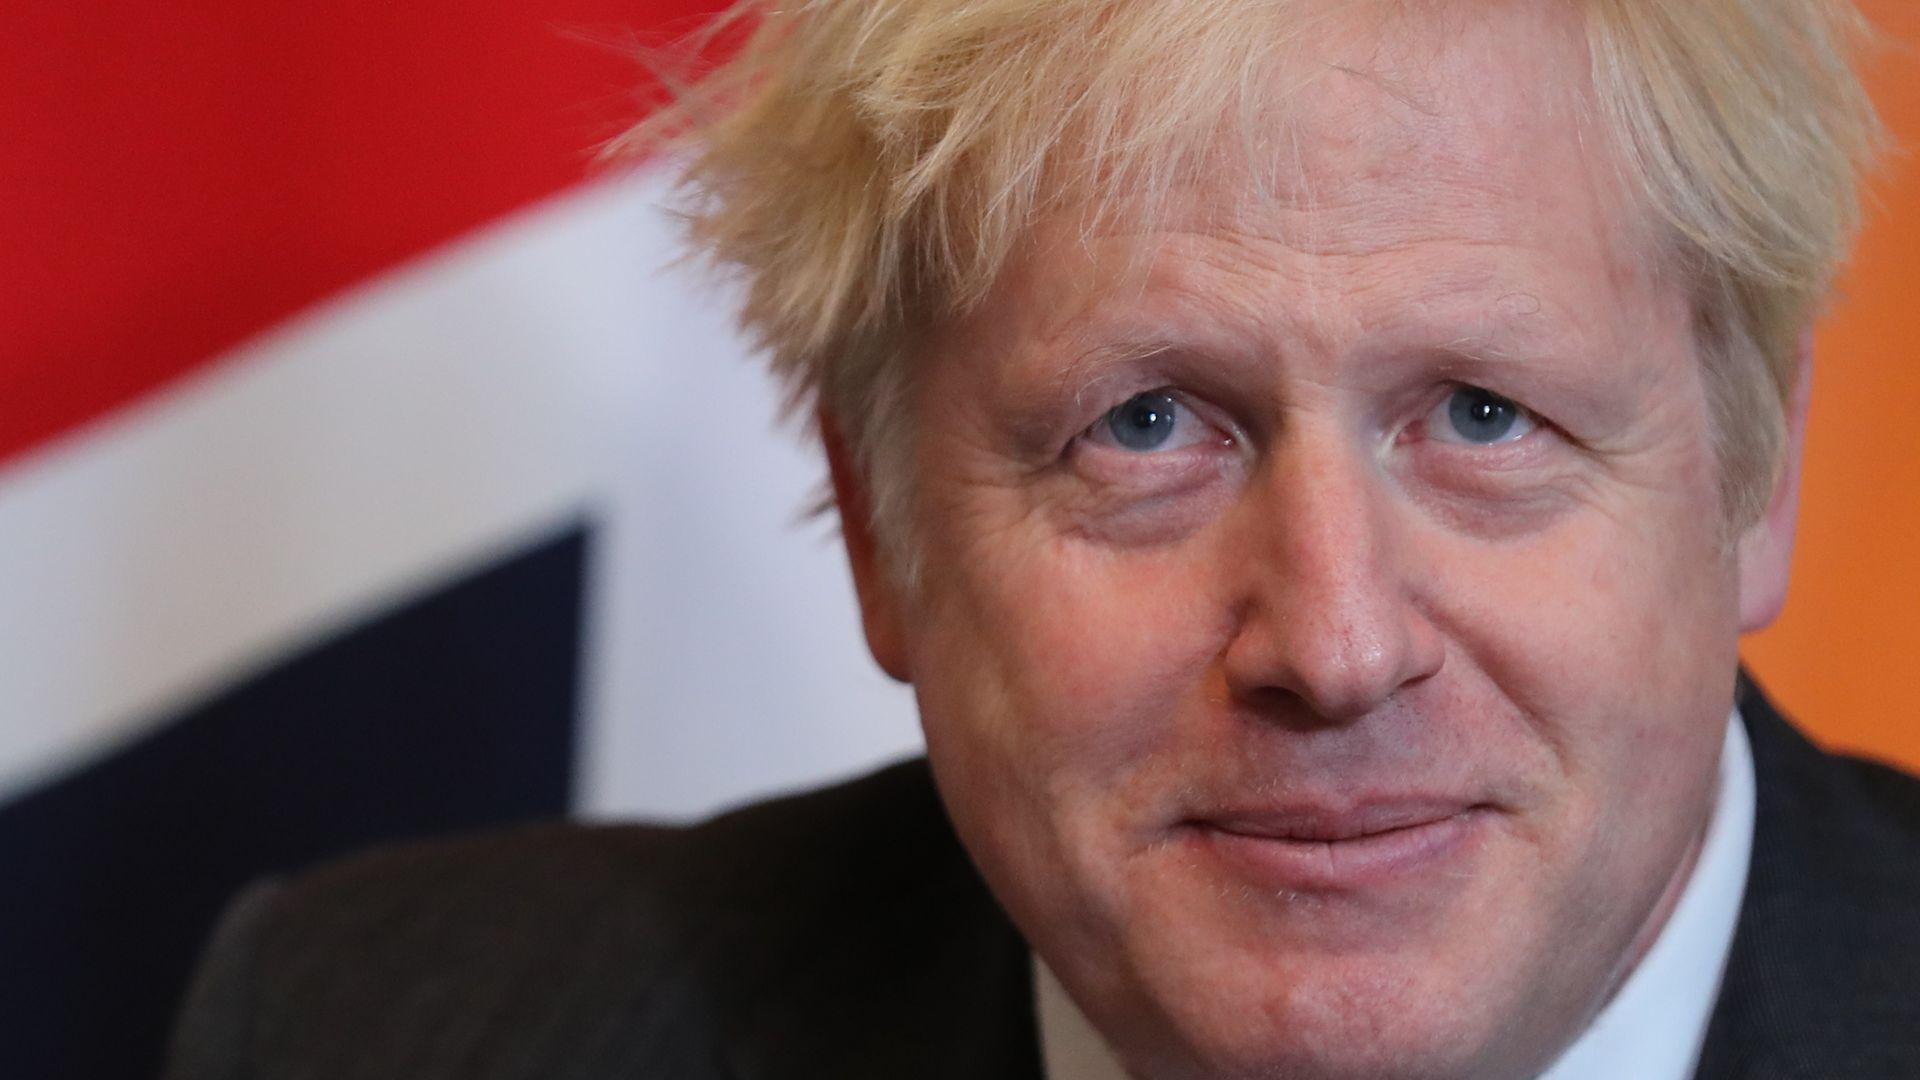 Prime Minister Boris Johnson in 10 Downing Street, London. - Credit: PA